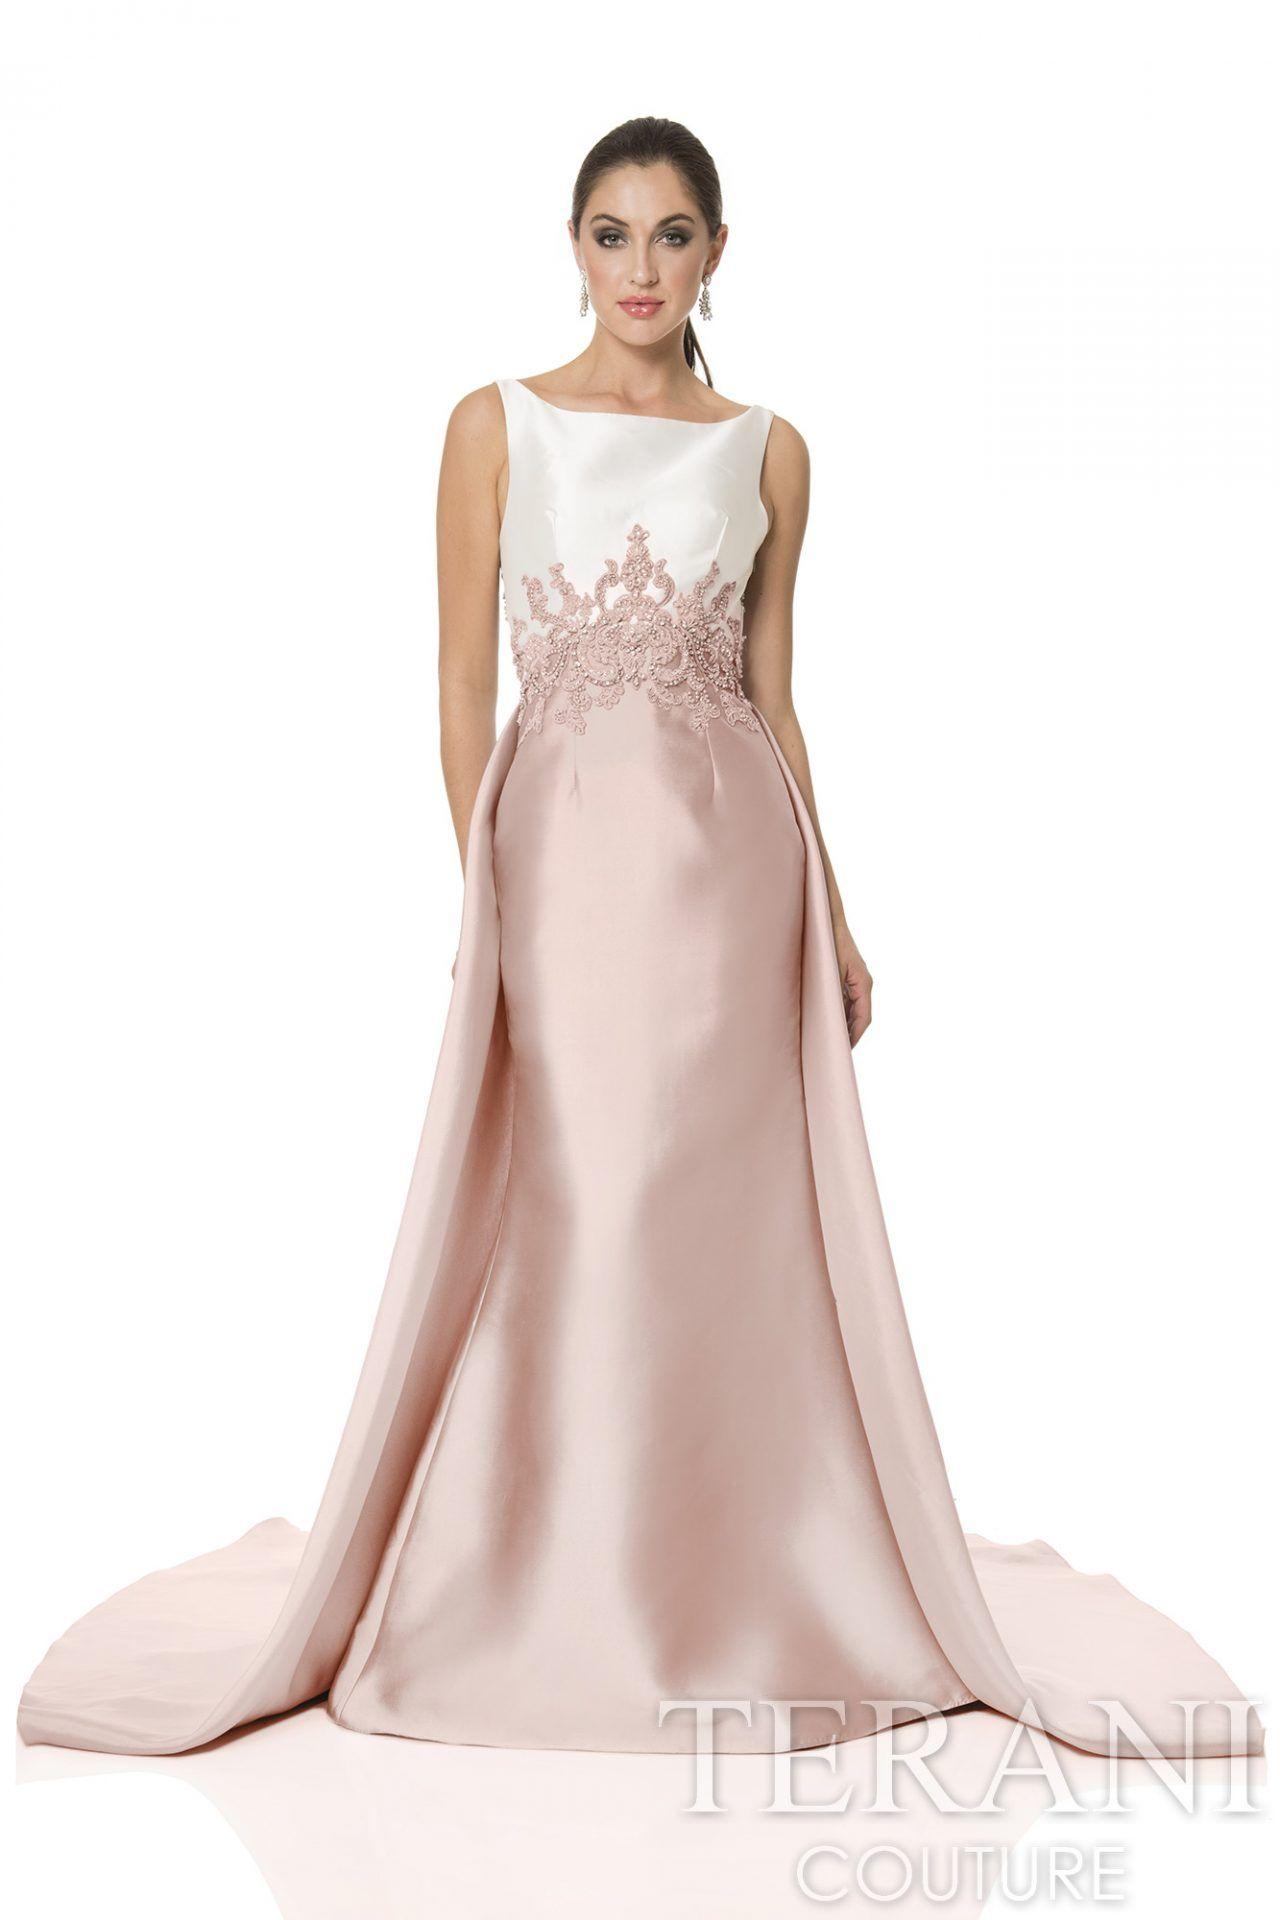 1611E0187-Ivory-Blush-Front.jpg (1280×1920) | Gowns Pannier ...